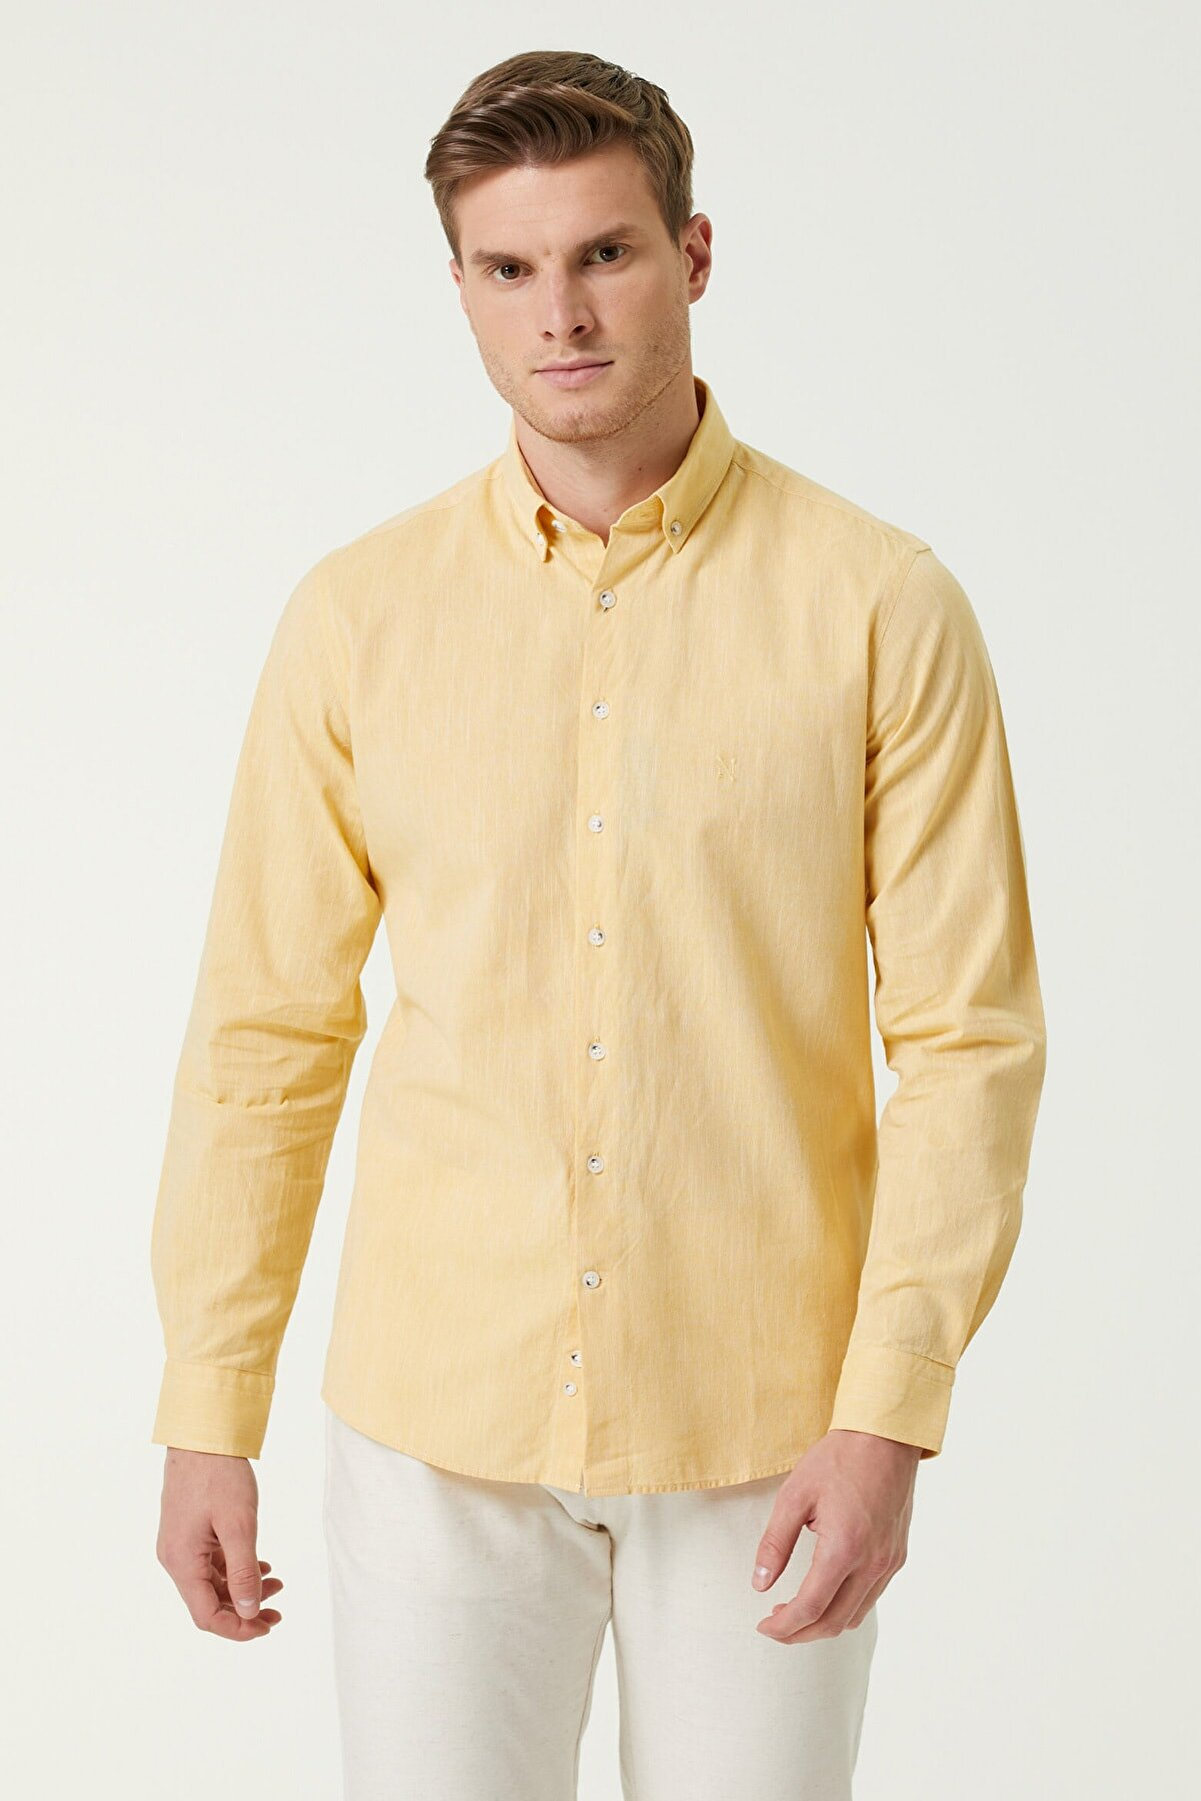 Network Erkek Slim Fit Sarı Gömlek 1079843